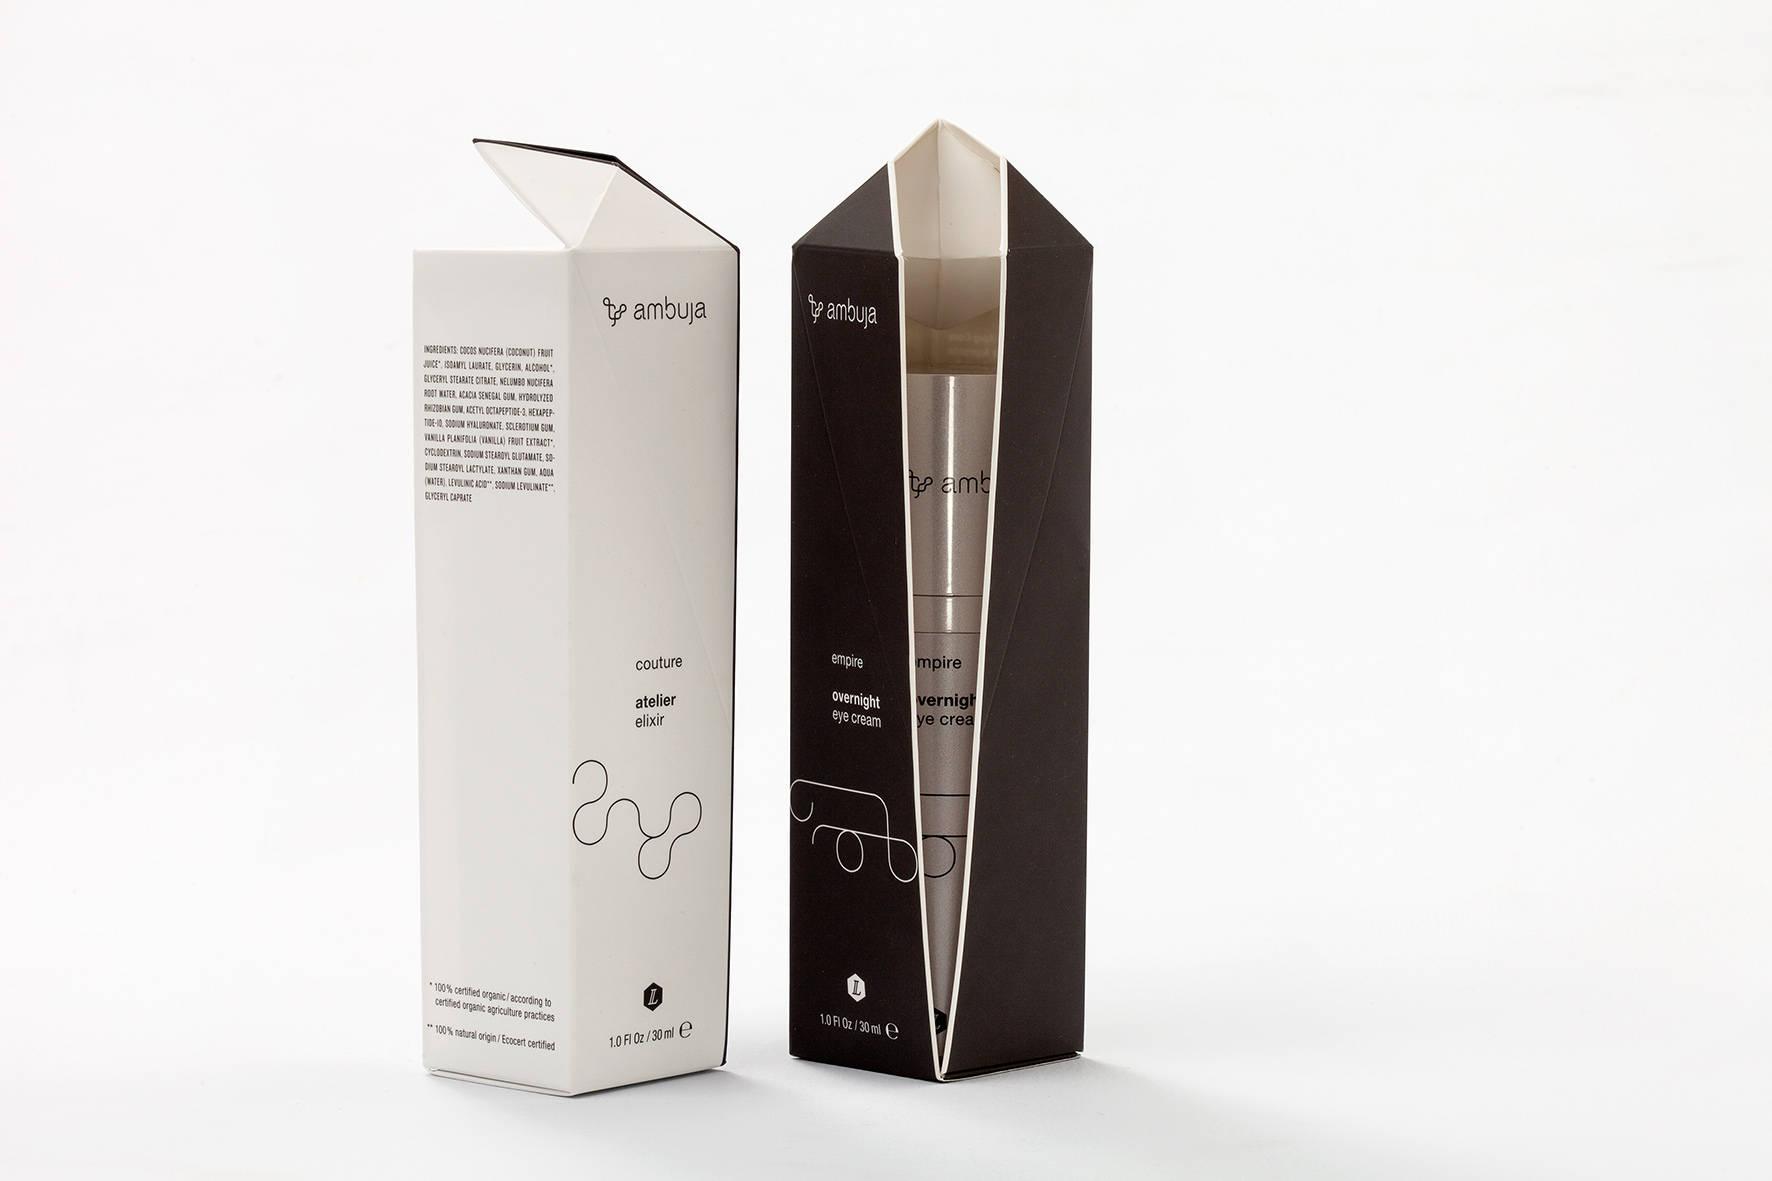 carton-award-image 113245